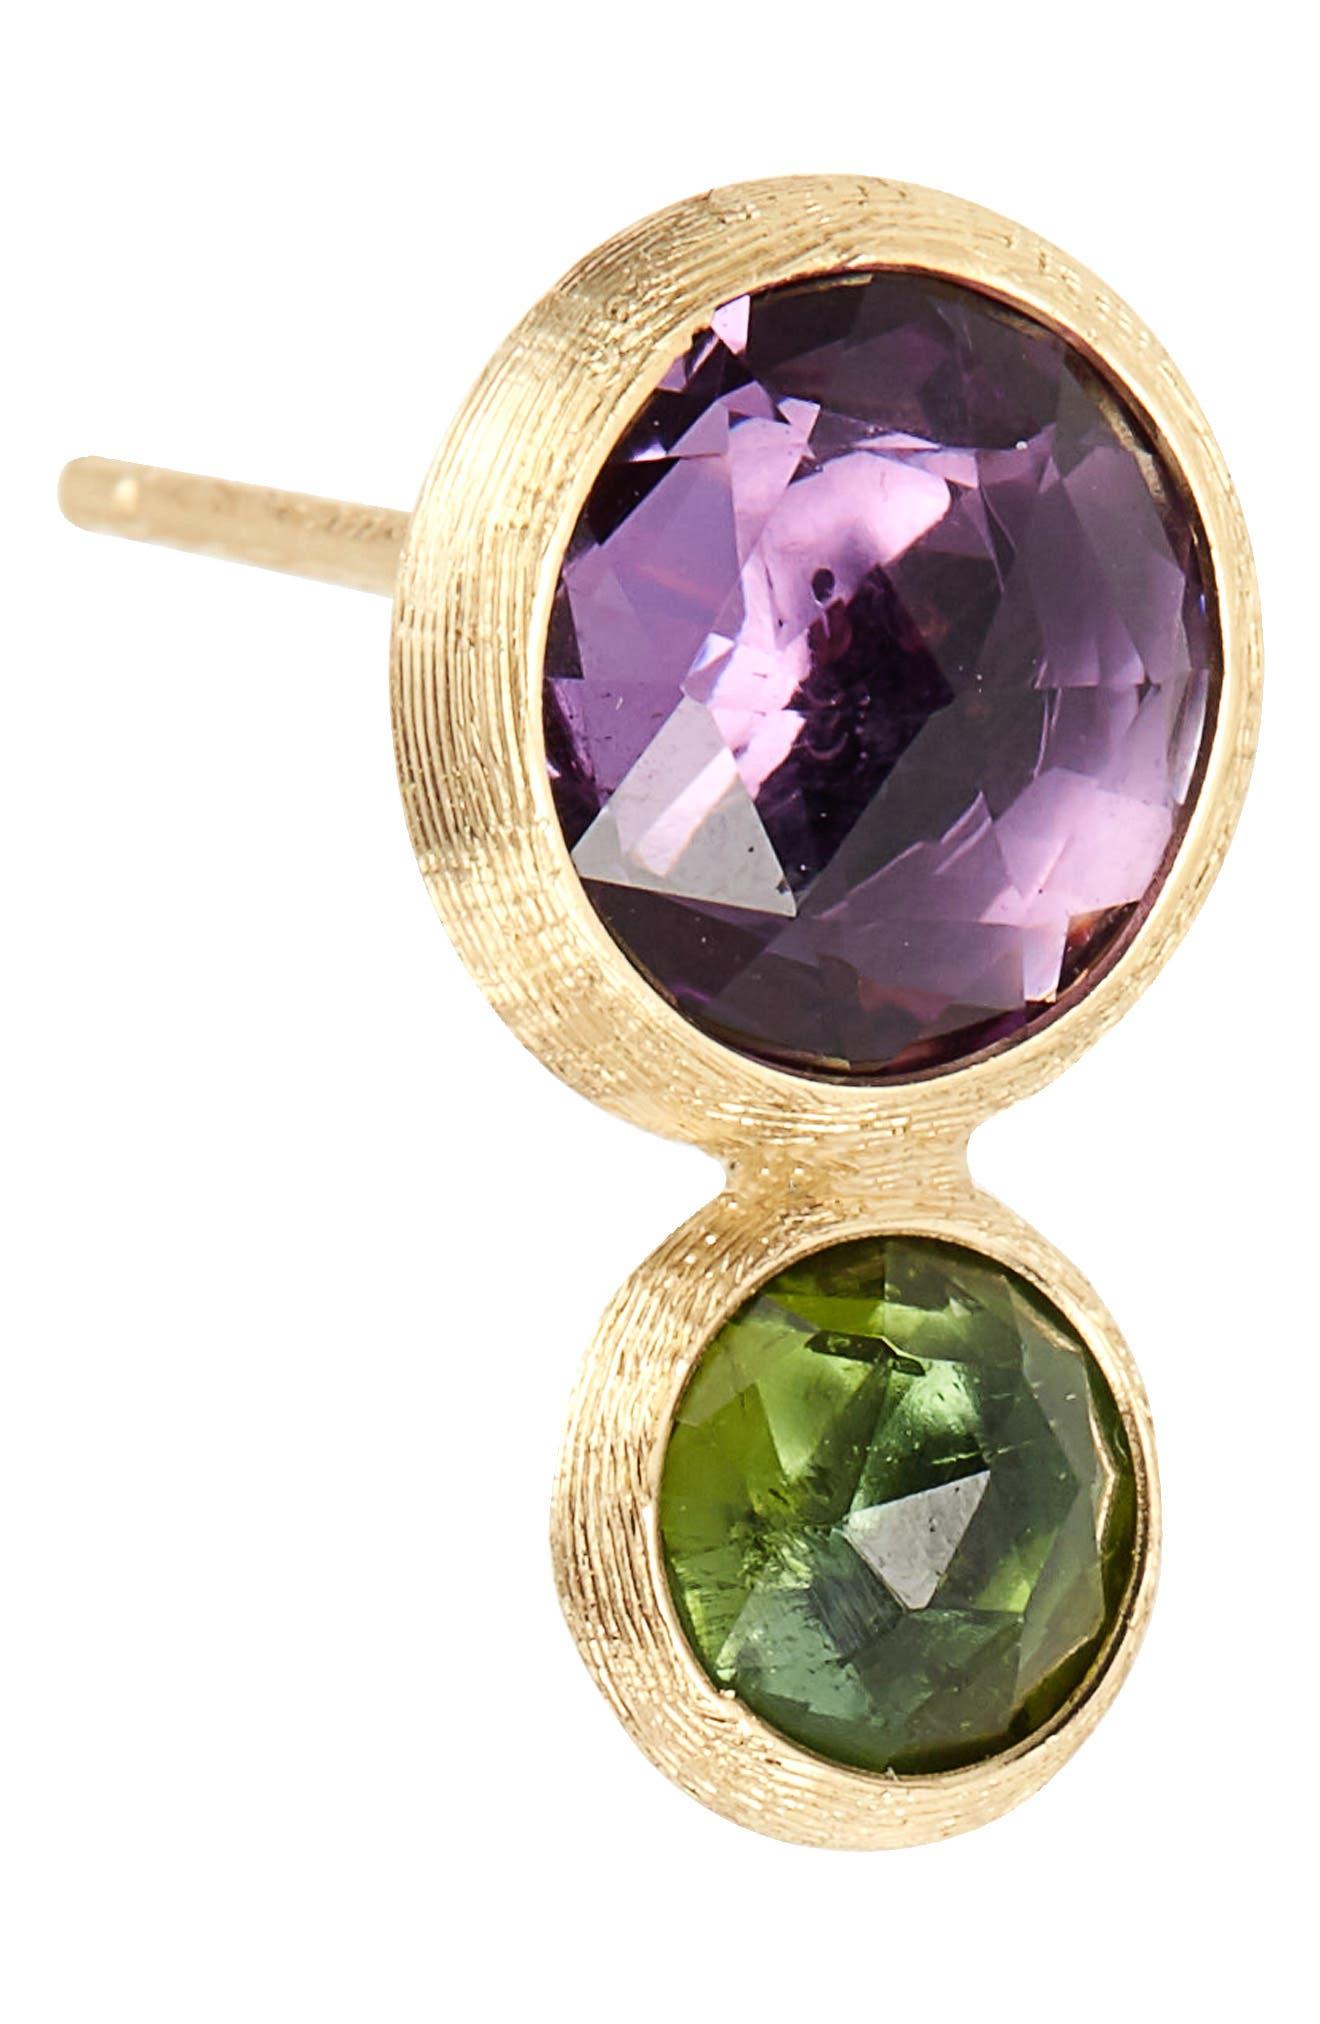 Jaipur Amethyst & Tourmaline Stud Earrings,                             Alternate thumbnail 5, color,                             710